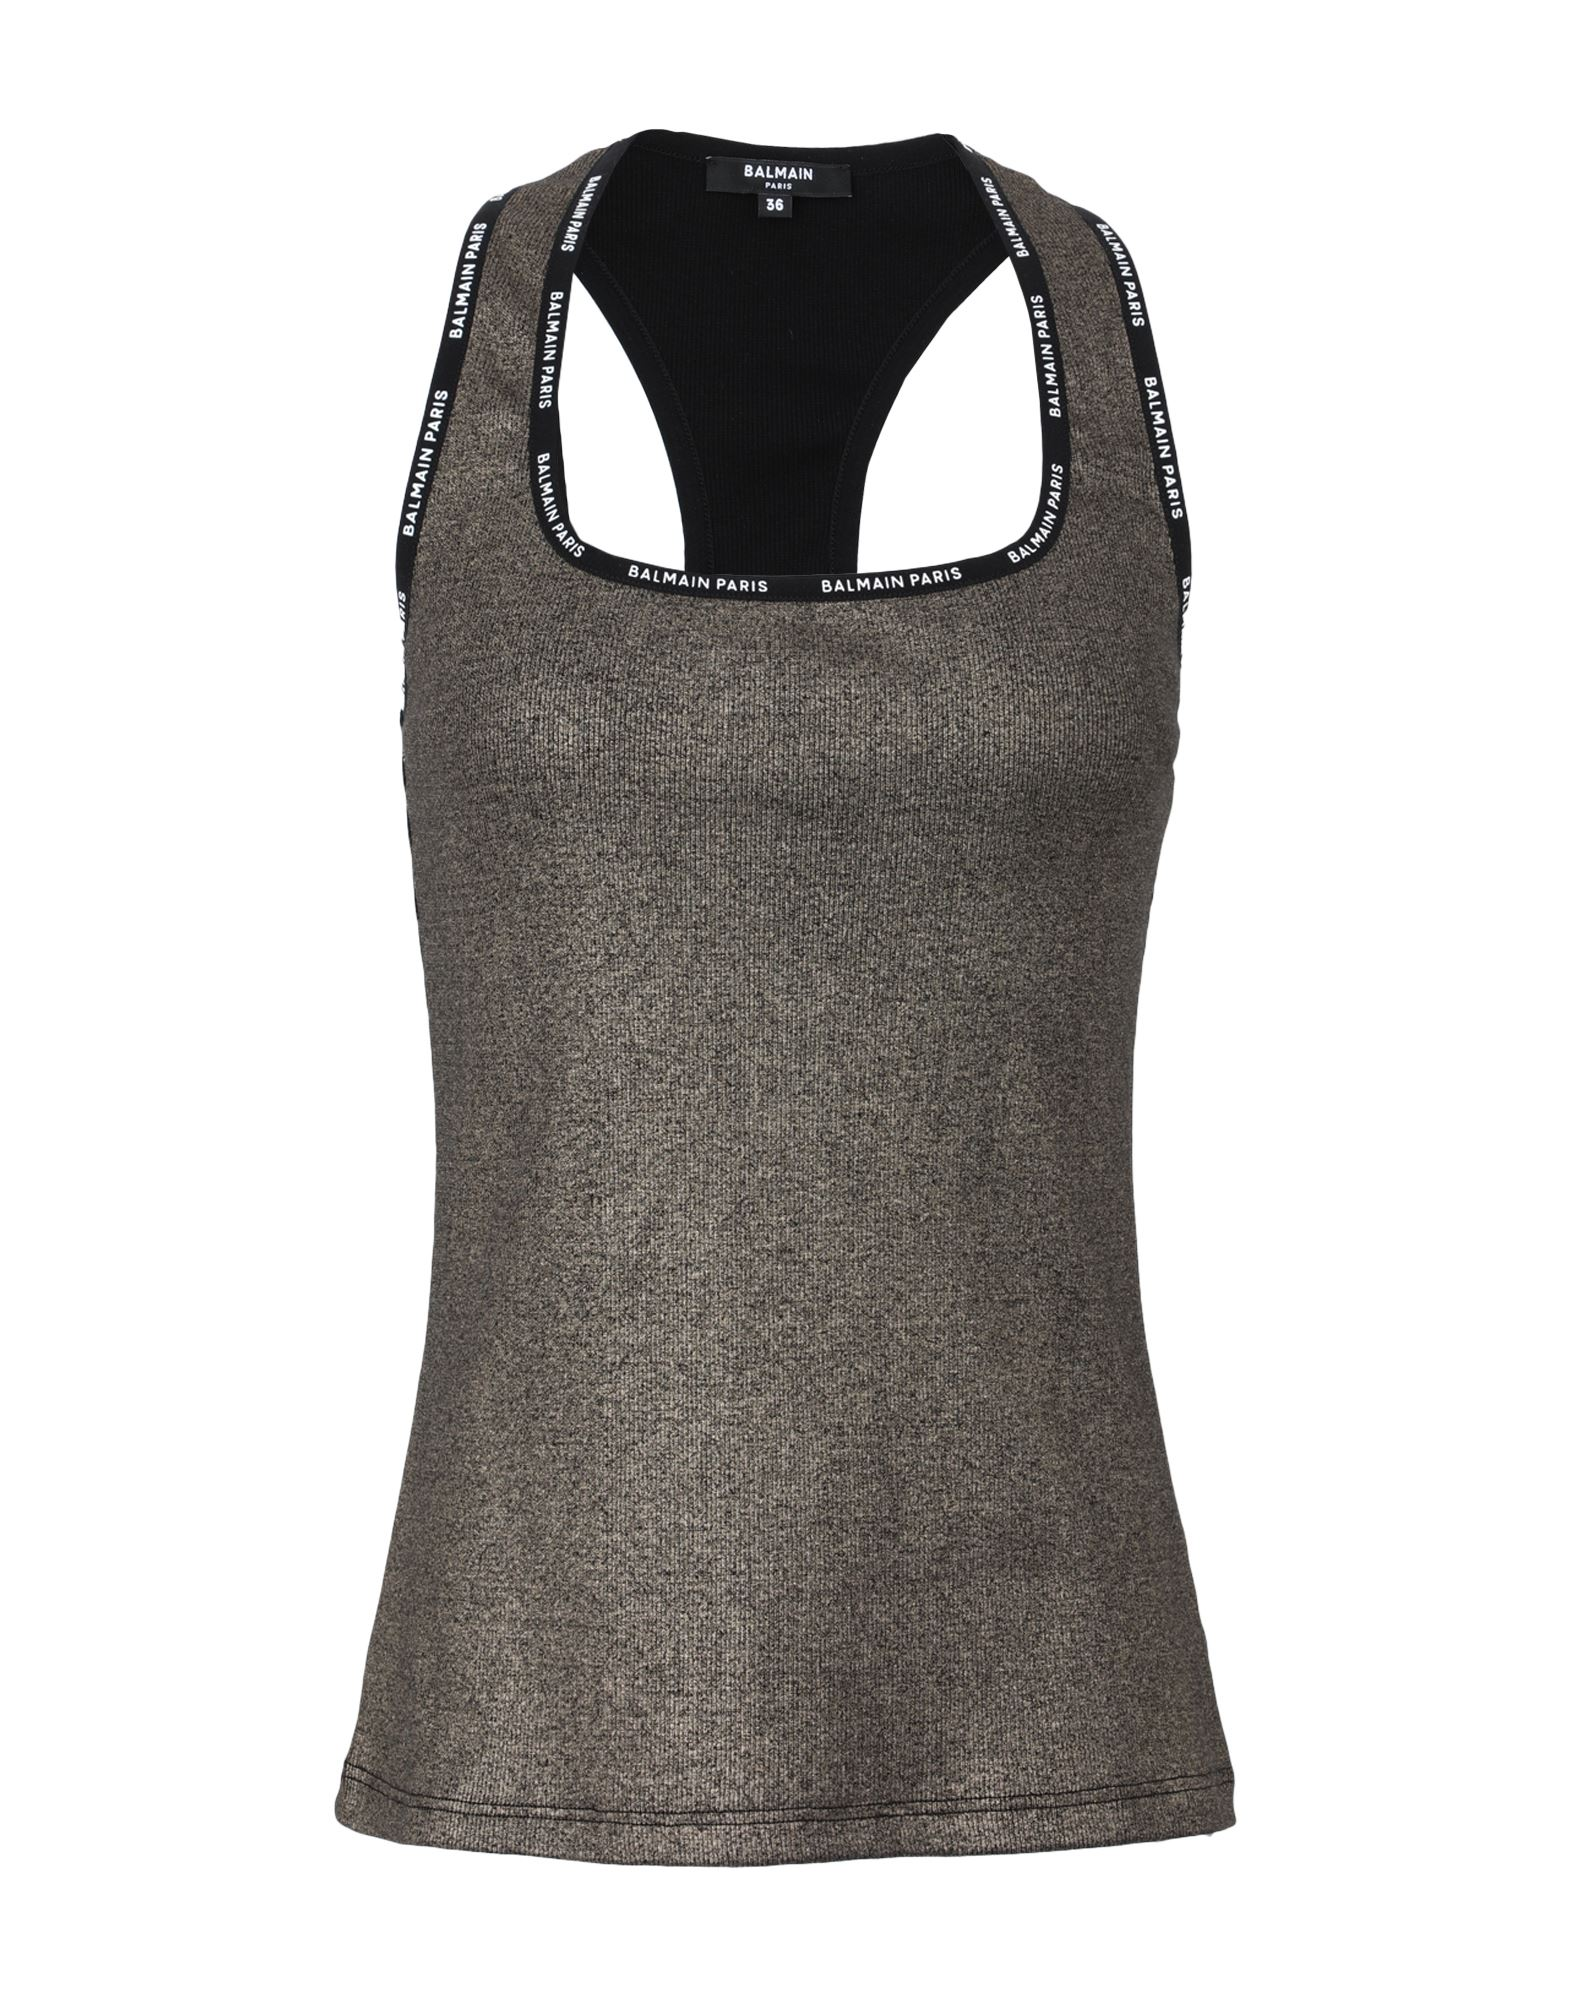 BALMAIN Tank tops. jersey, laminated effect, logo, solid color, square neckline, sleeveless, stretch. 95% Cotton, 5% Elastane